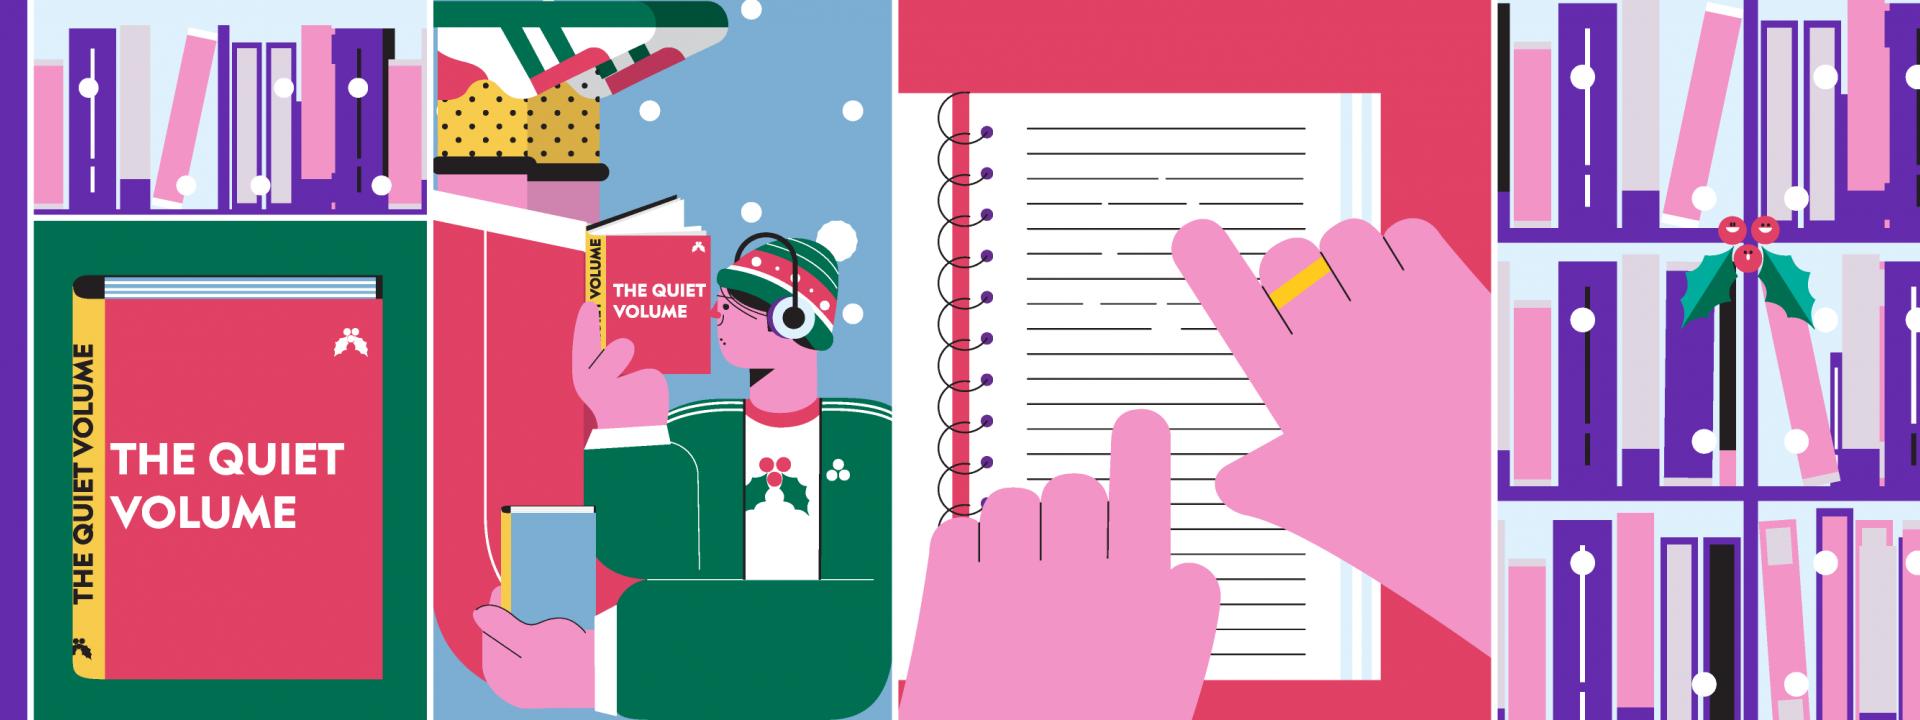 Animation με χριστουγεννιάτικη διάθεση και εορταστικά χρώματα για την performance The Quiet Volume